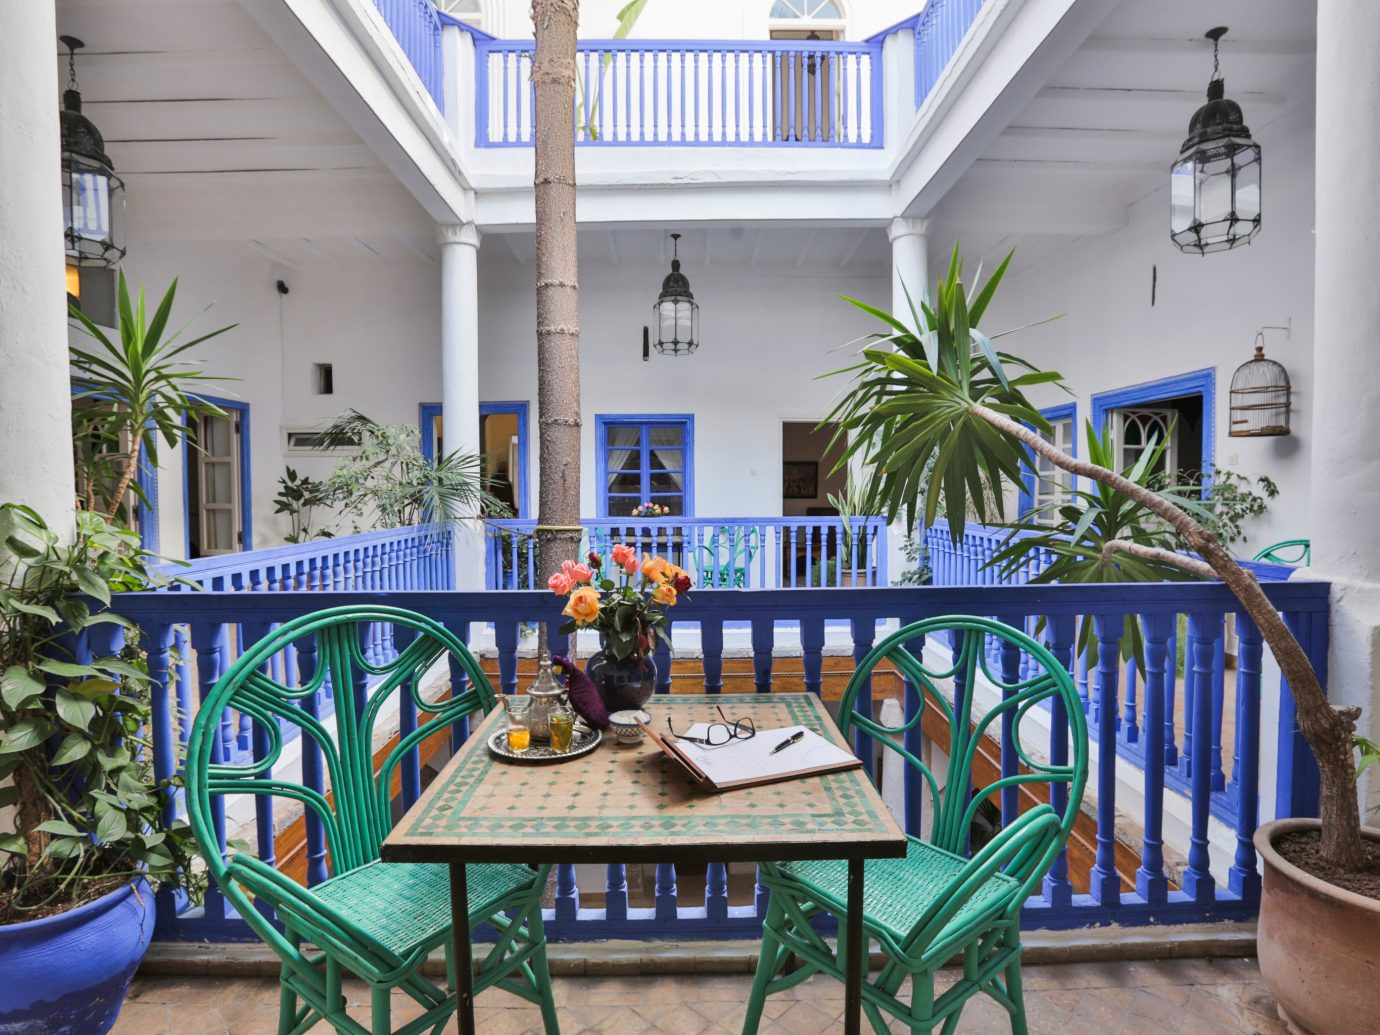 Trip Ideas plant property estate room home house Resort real estate Courtyard Villa mansion interior design backyard Dining cottage condominium porch furniture Garden